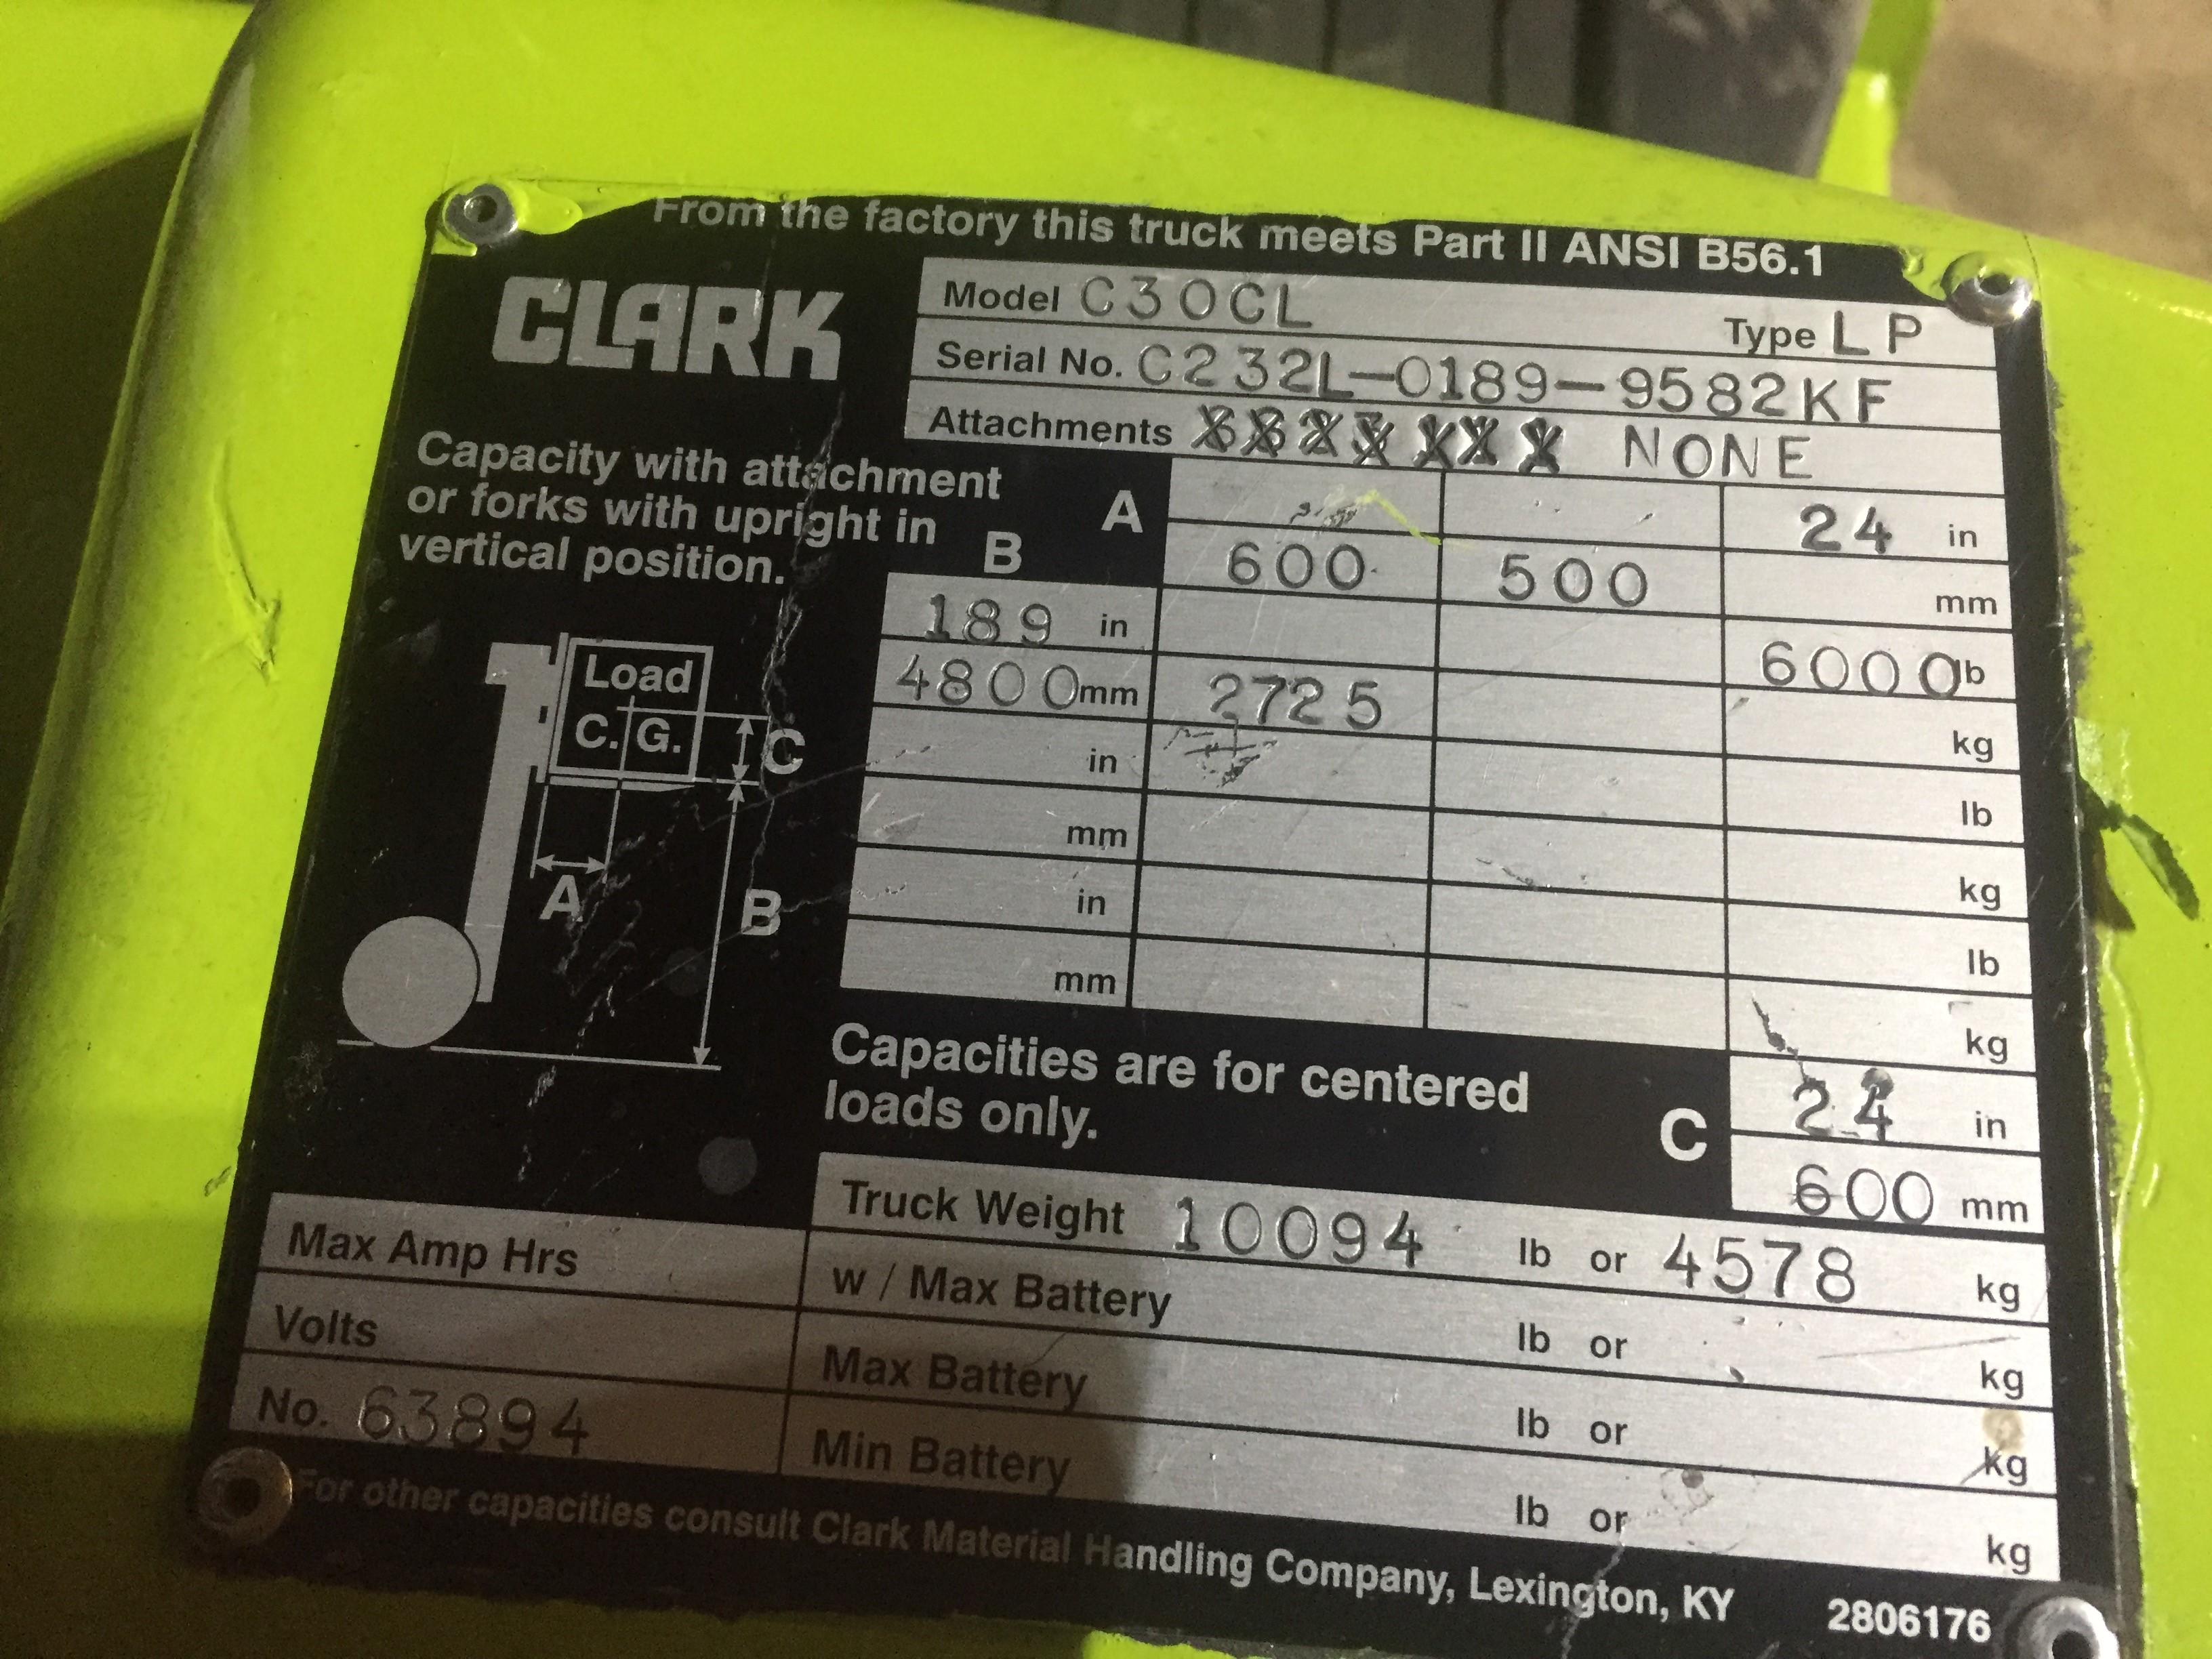 CLARK (MODEL #C30CL) 6000LBS LP 2 STAGE FORKLIFT - SERIAL #C232L-0189-9582KF - Image 4 of 6